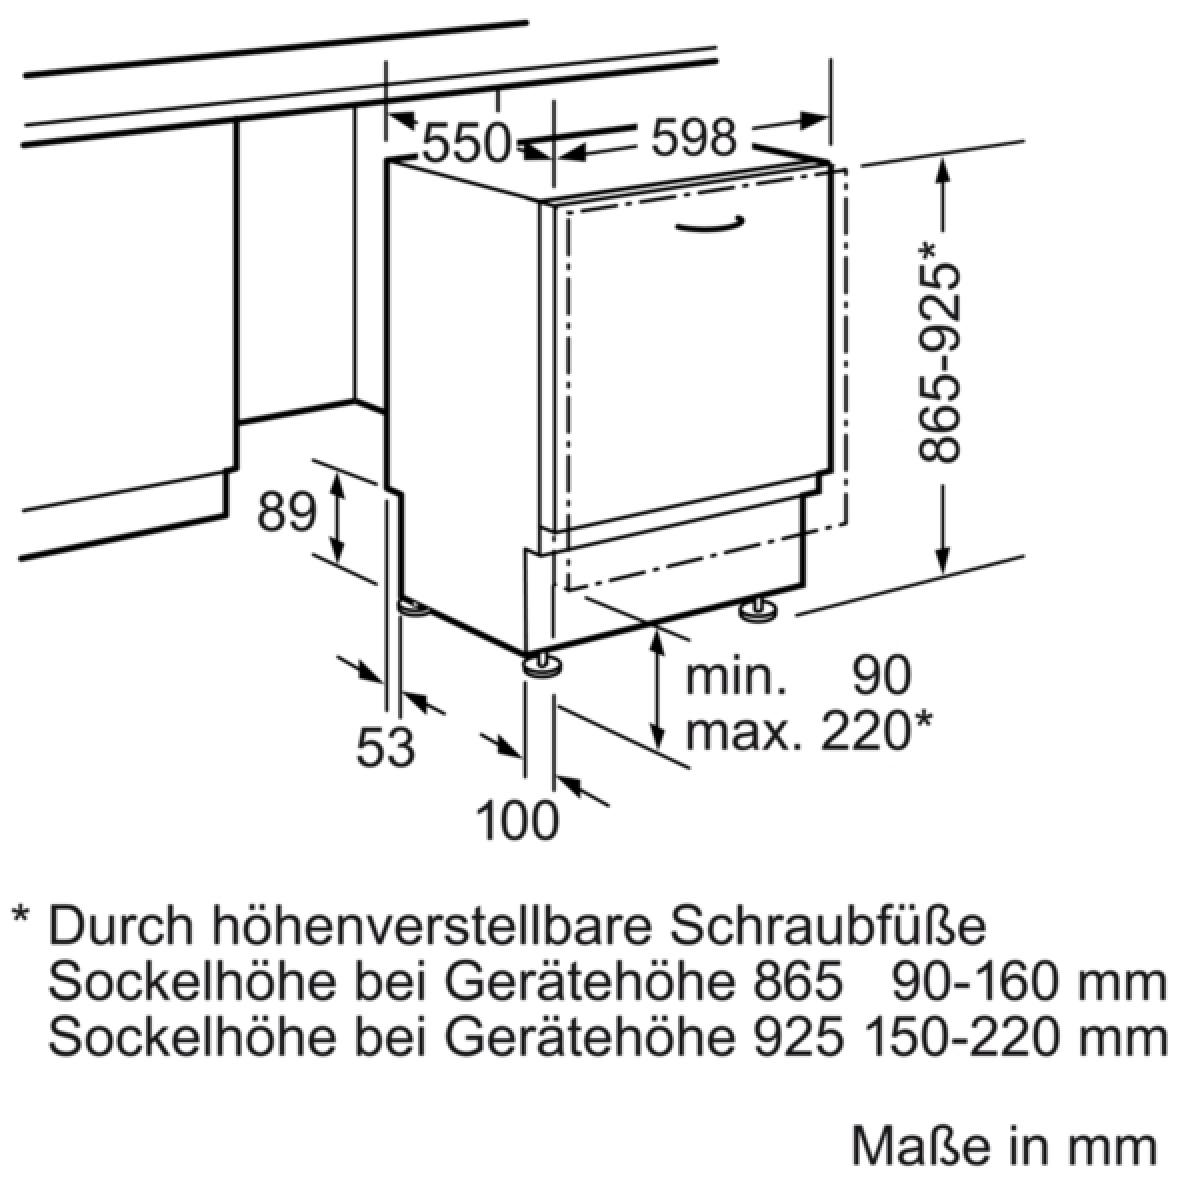 neff gx3600g s523g60x0e geschirrsp ler 60 cm vollintegrierbar xxl 46db a g nstig kaufen. Black Bedroom Furniture Sets. Home Design Ideas